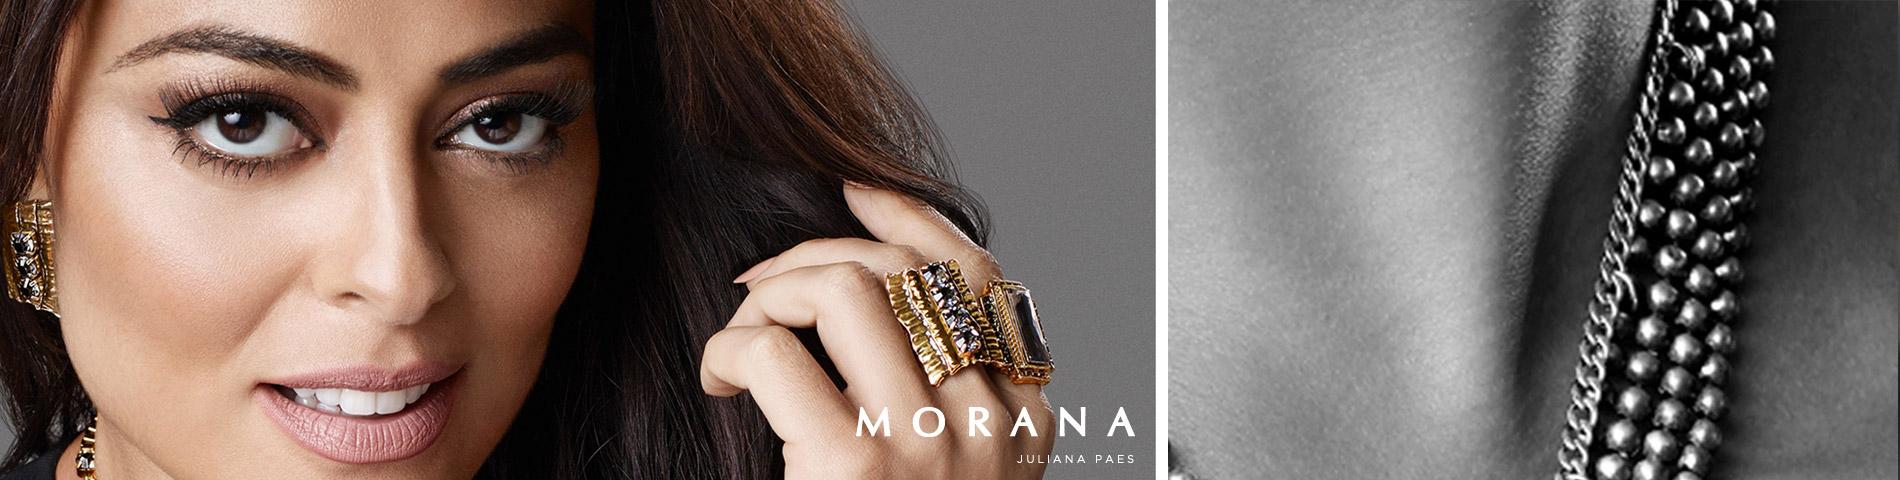 Campanha Morana - Juliana Paes